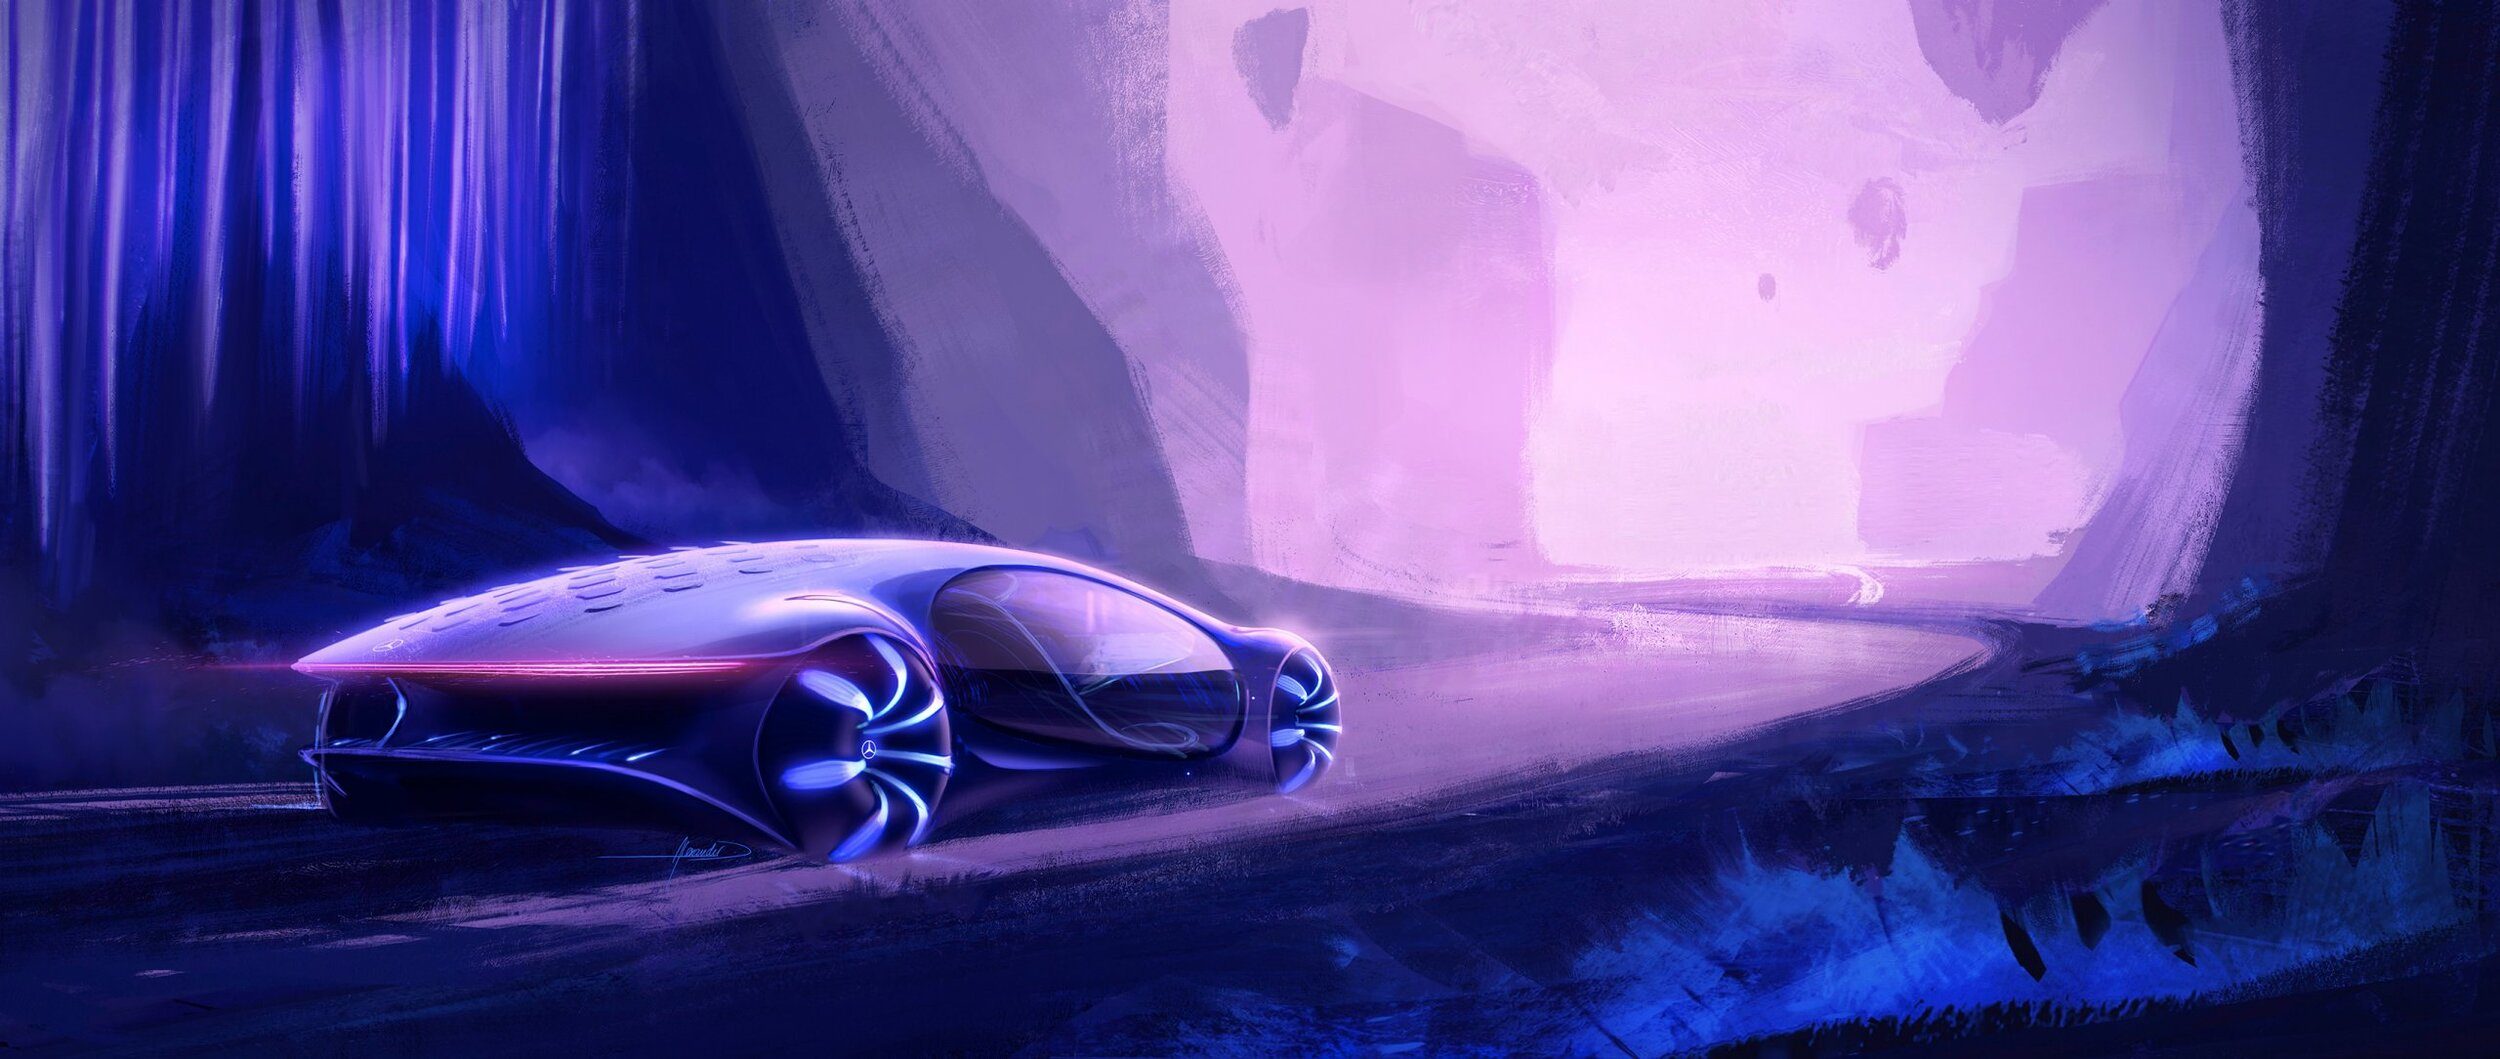 19-mercedes-benz-vehicles-concept-cars-vision-avtr-3400x1440.jpeg